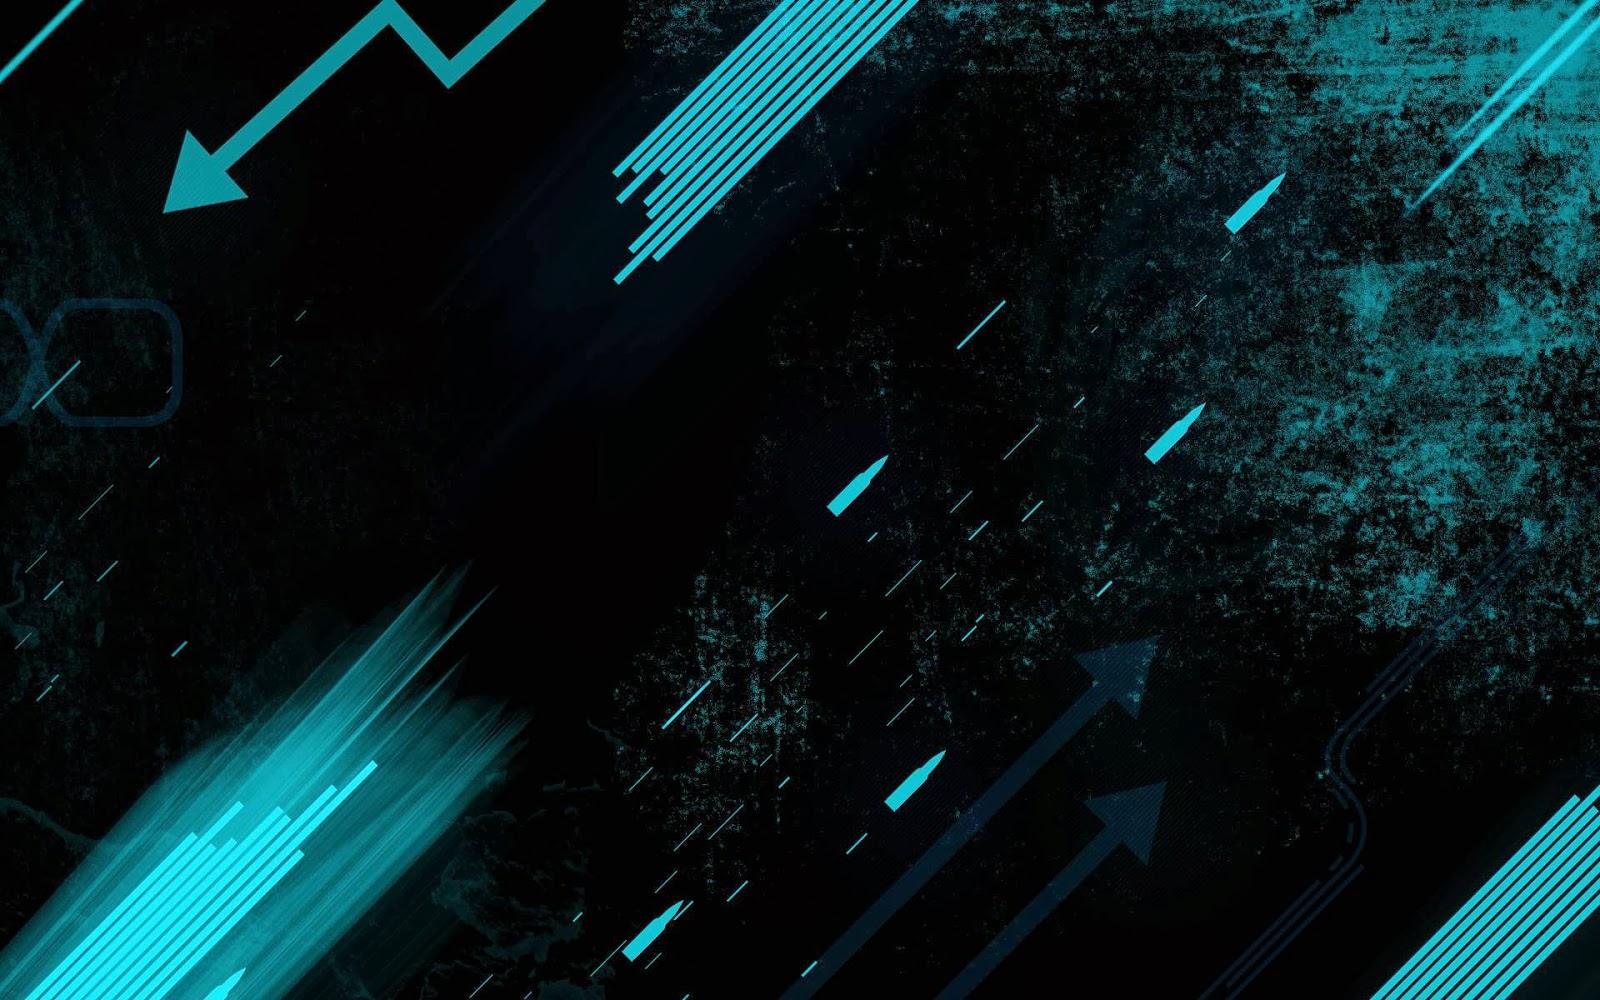 fondo de pantalla abstracto flechas y barras azules